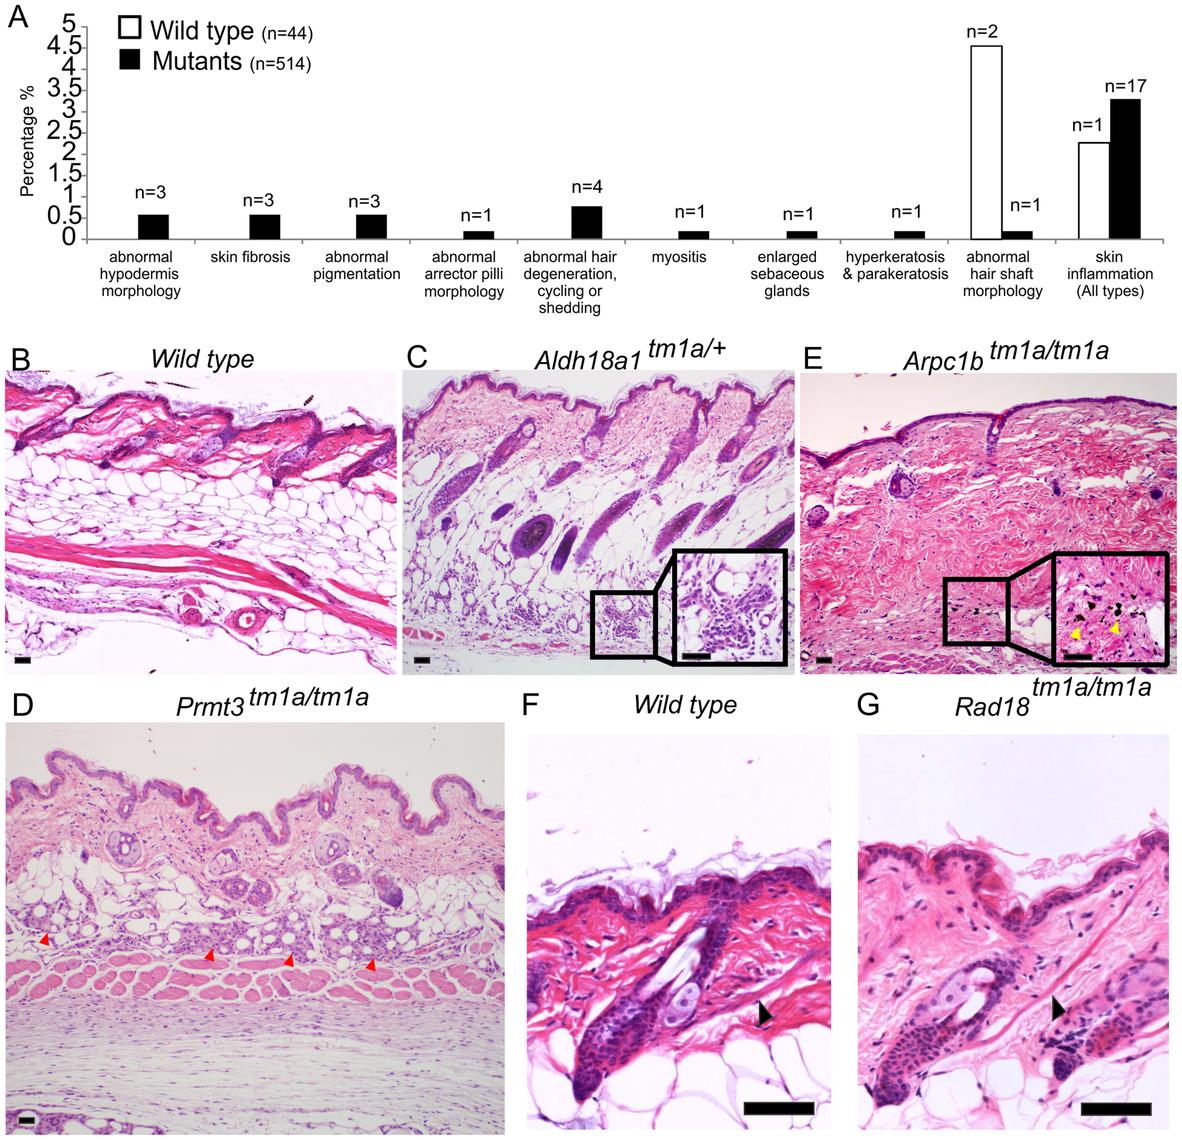 Skin histopathology overview.